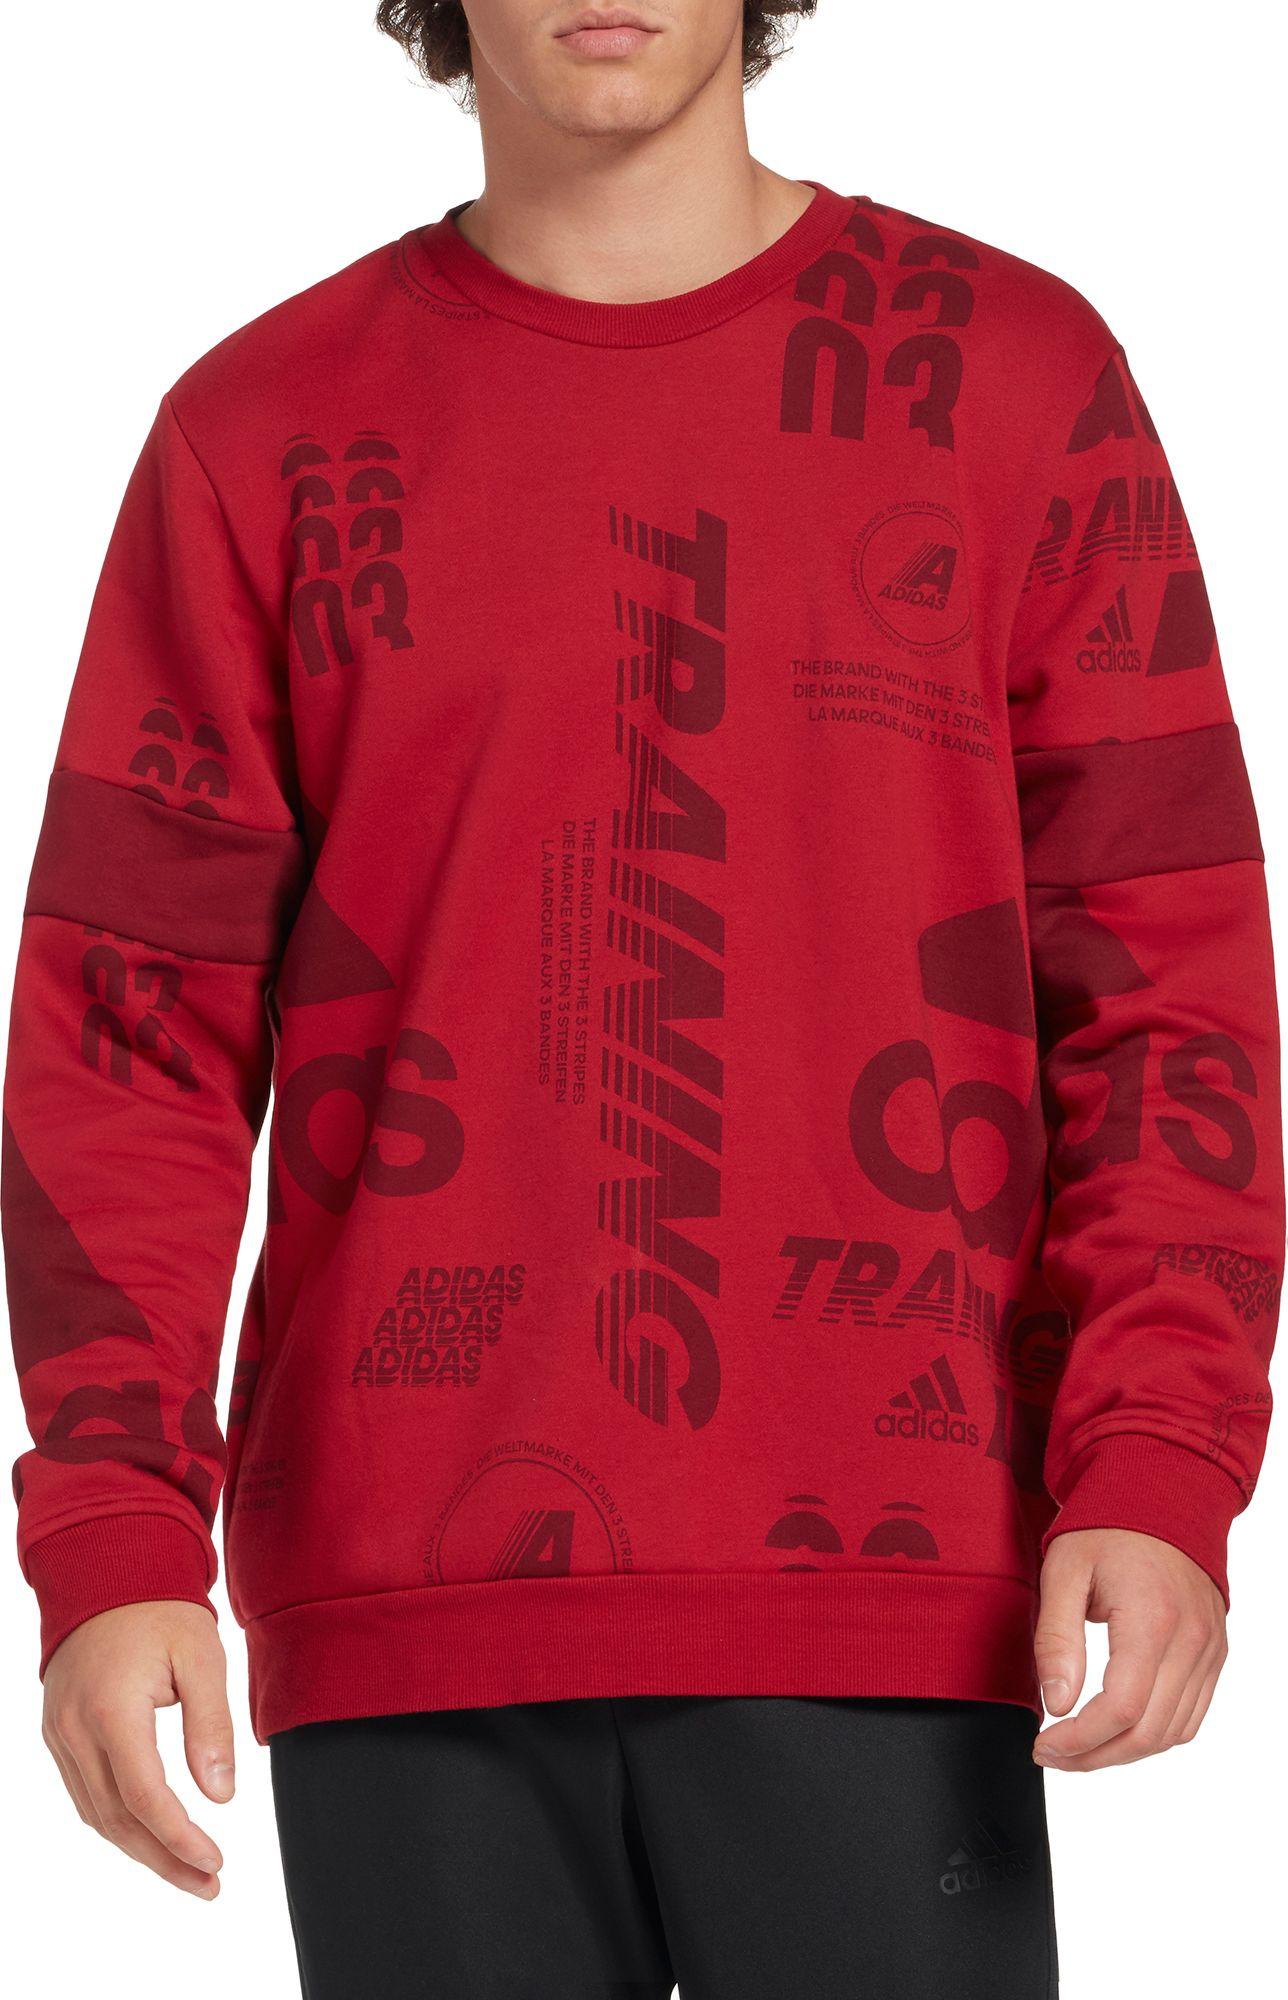 Adidas Sweatshirt Men's Crewneck Allover Post Game Print kTOiPXZu